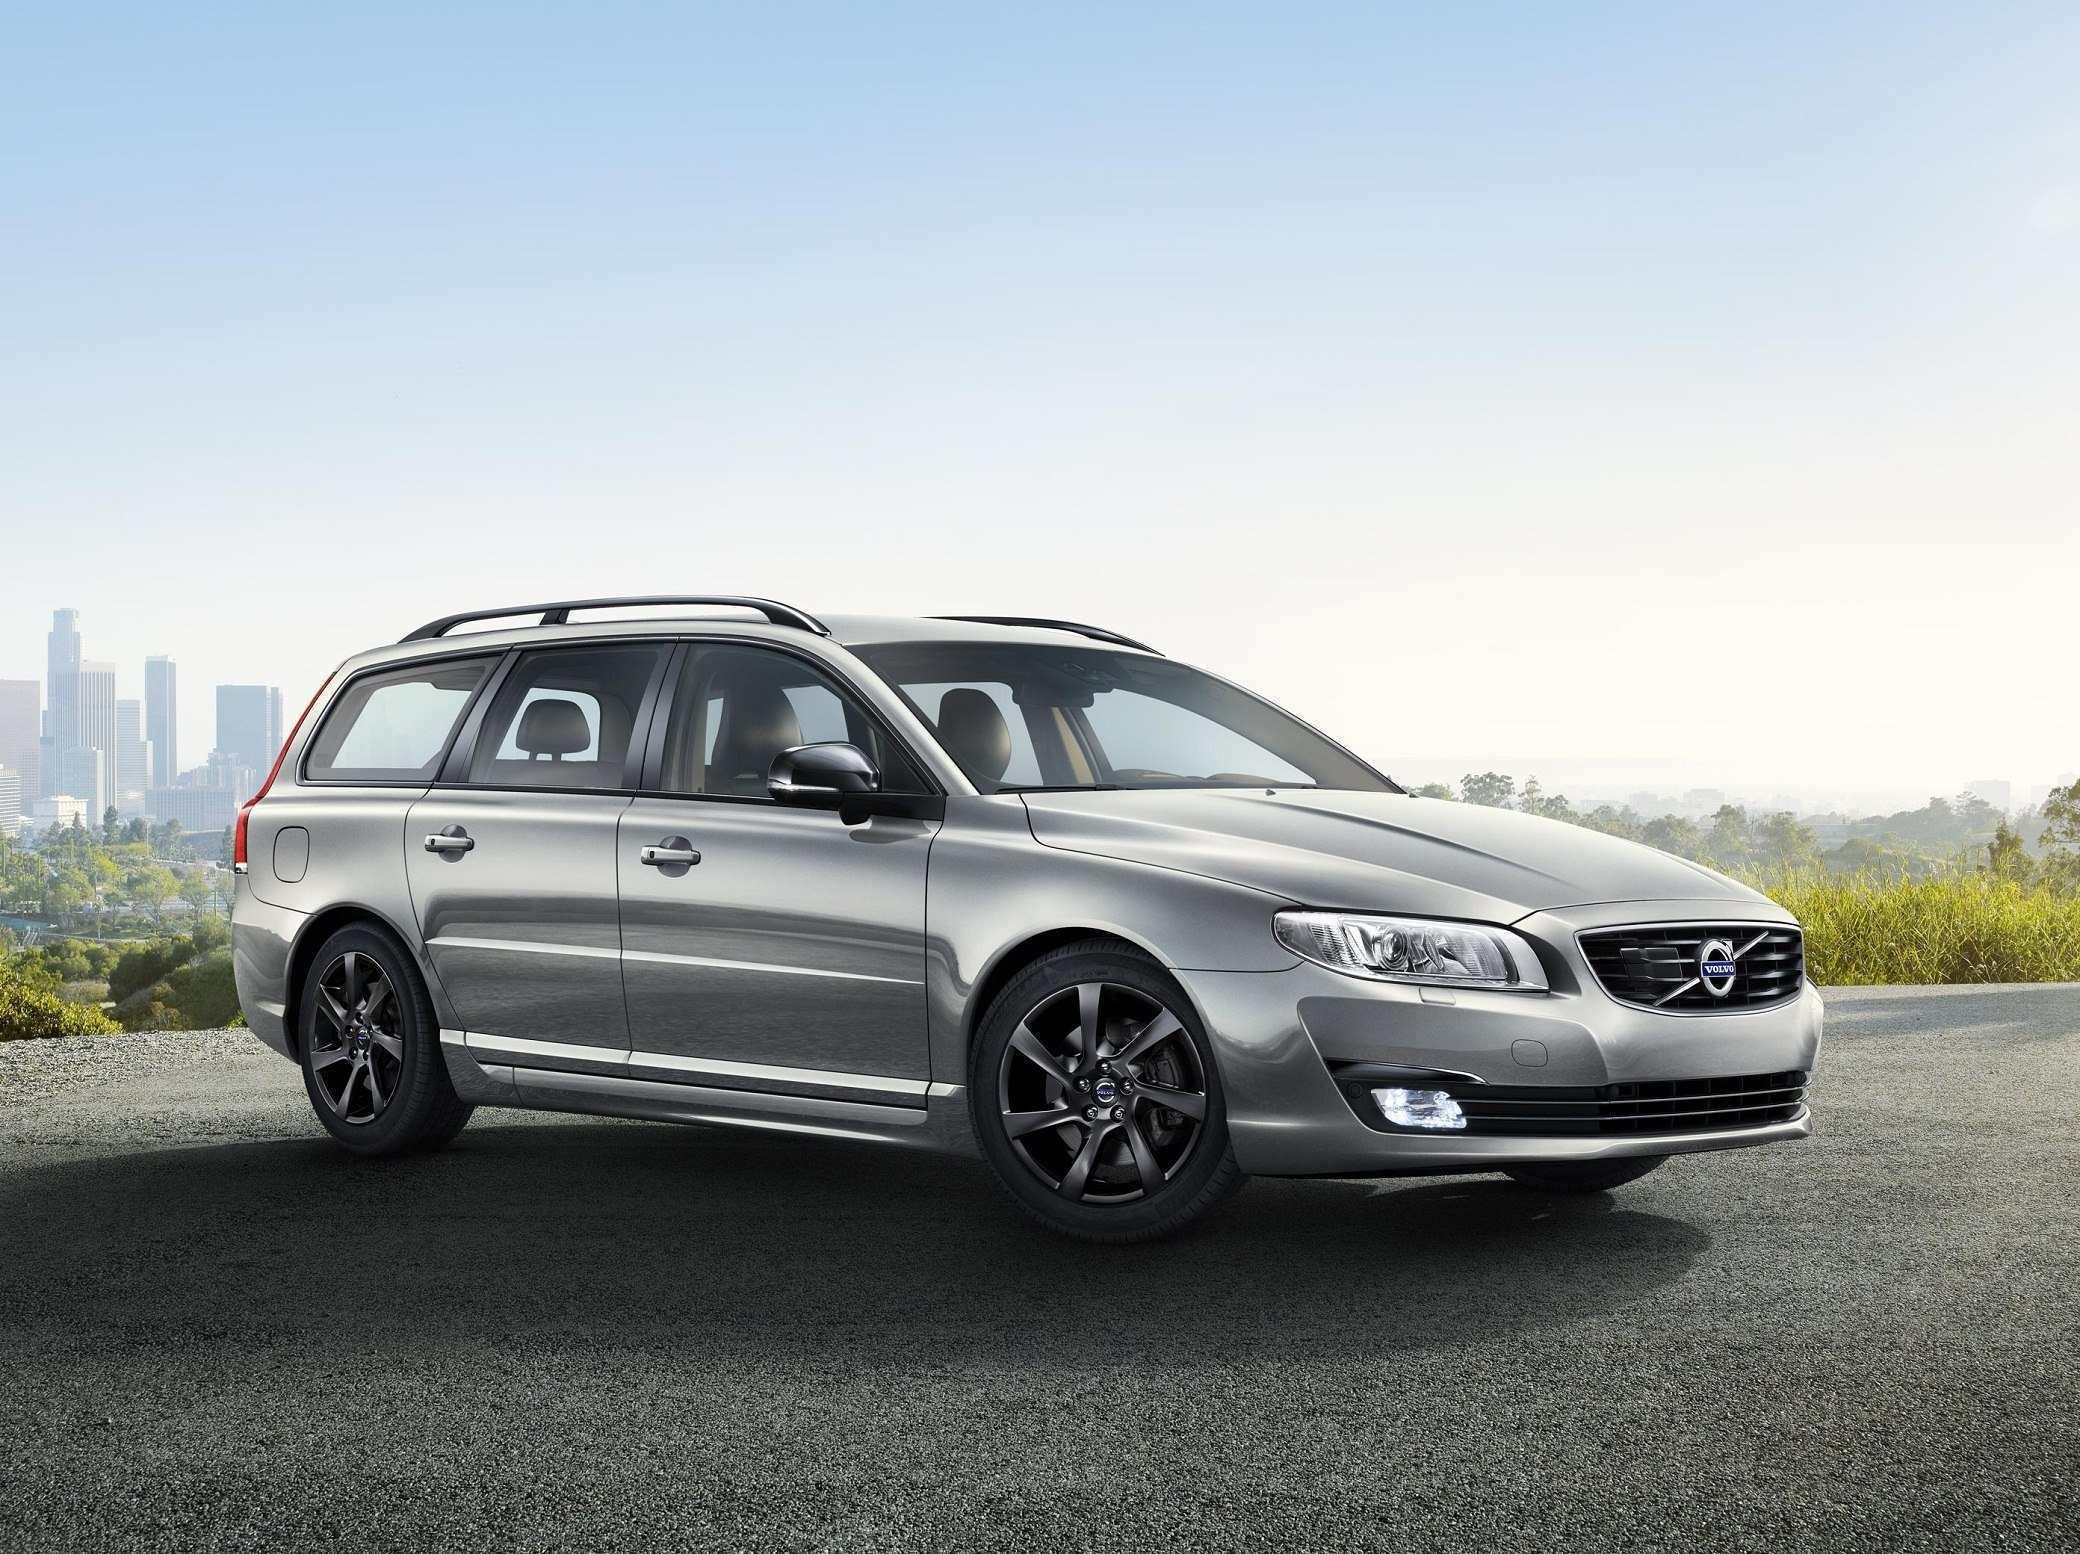 93 Best Review 2020 Volvo V70 2018 Prices by 2020 Volvo V70 2018